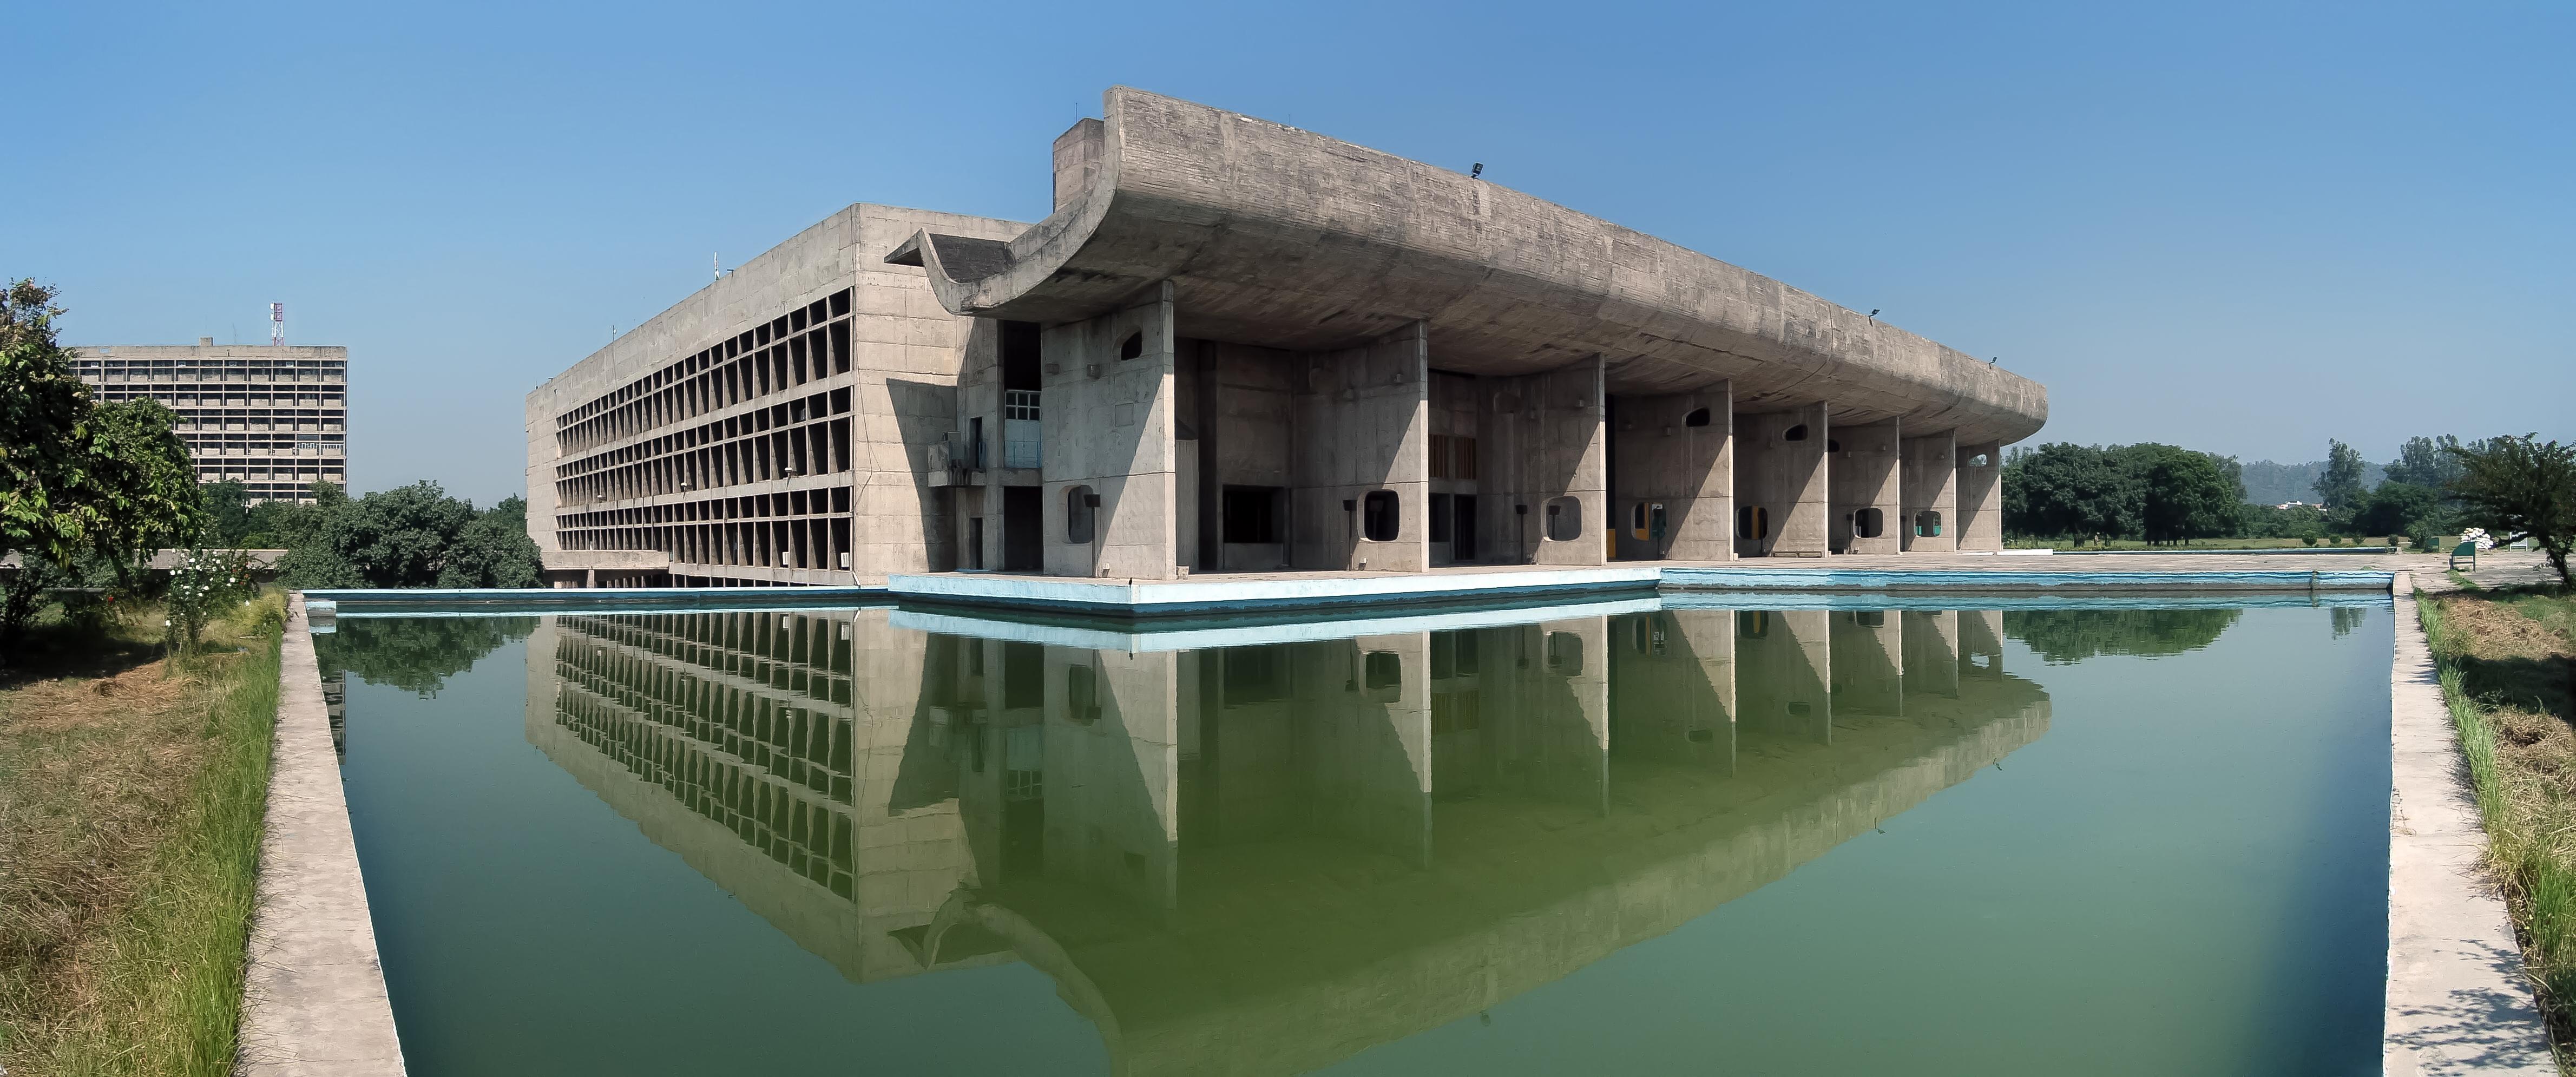 File:Palace of Assembly Chandigarh 2006.jpg